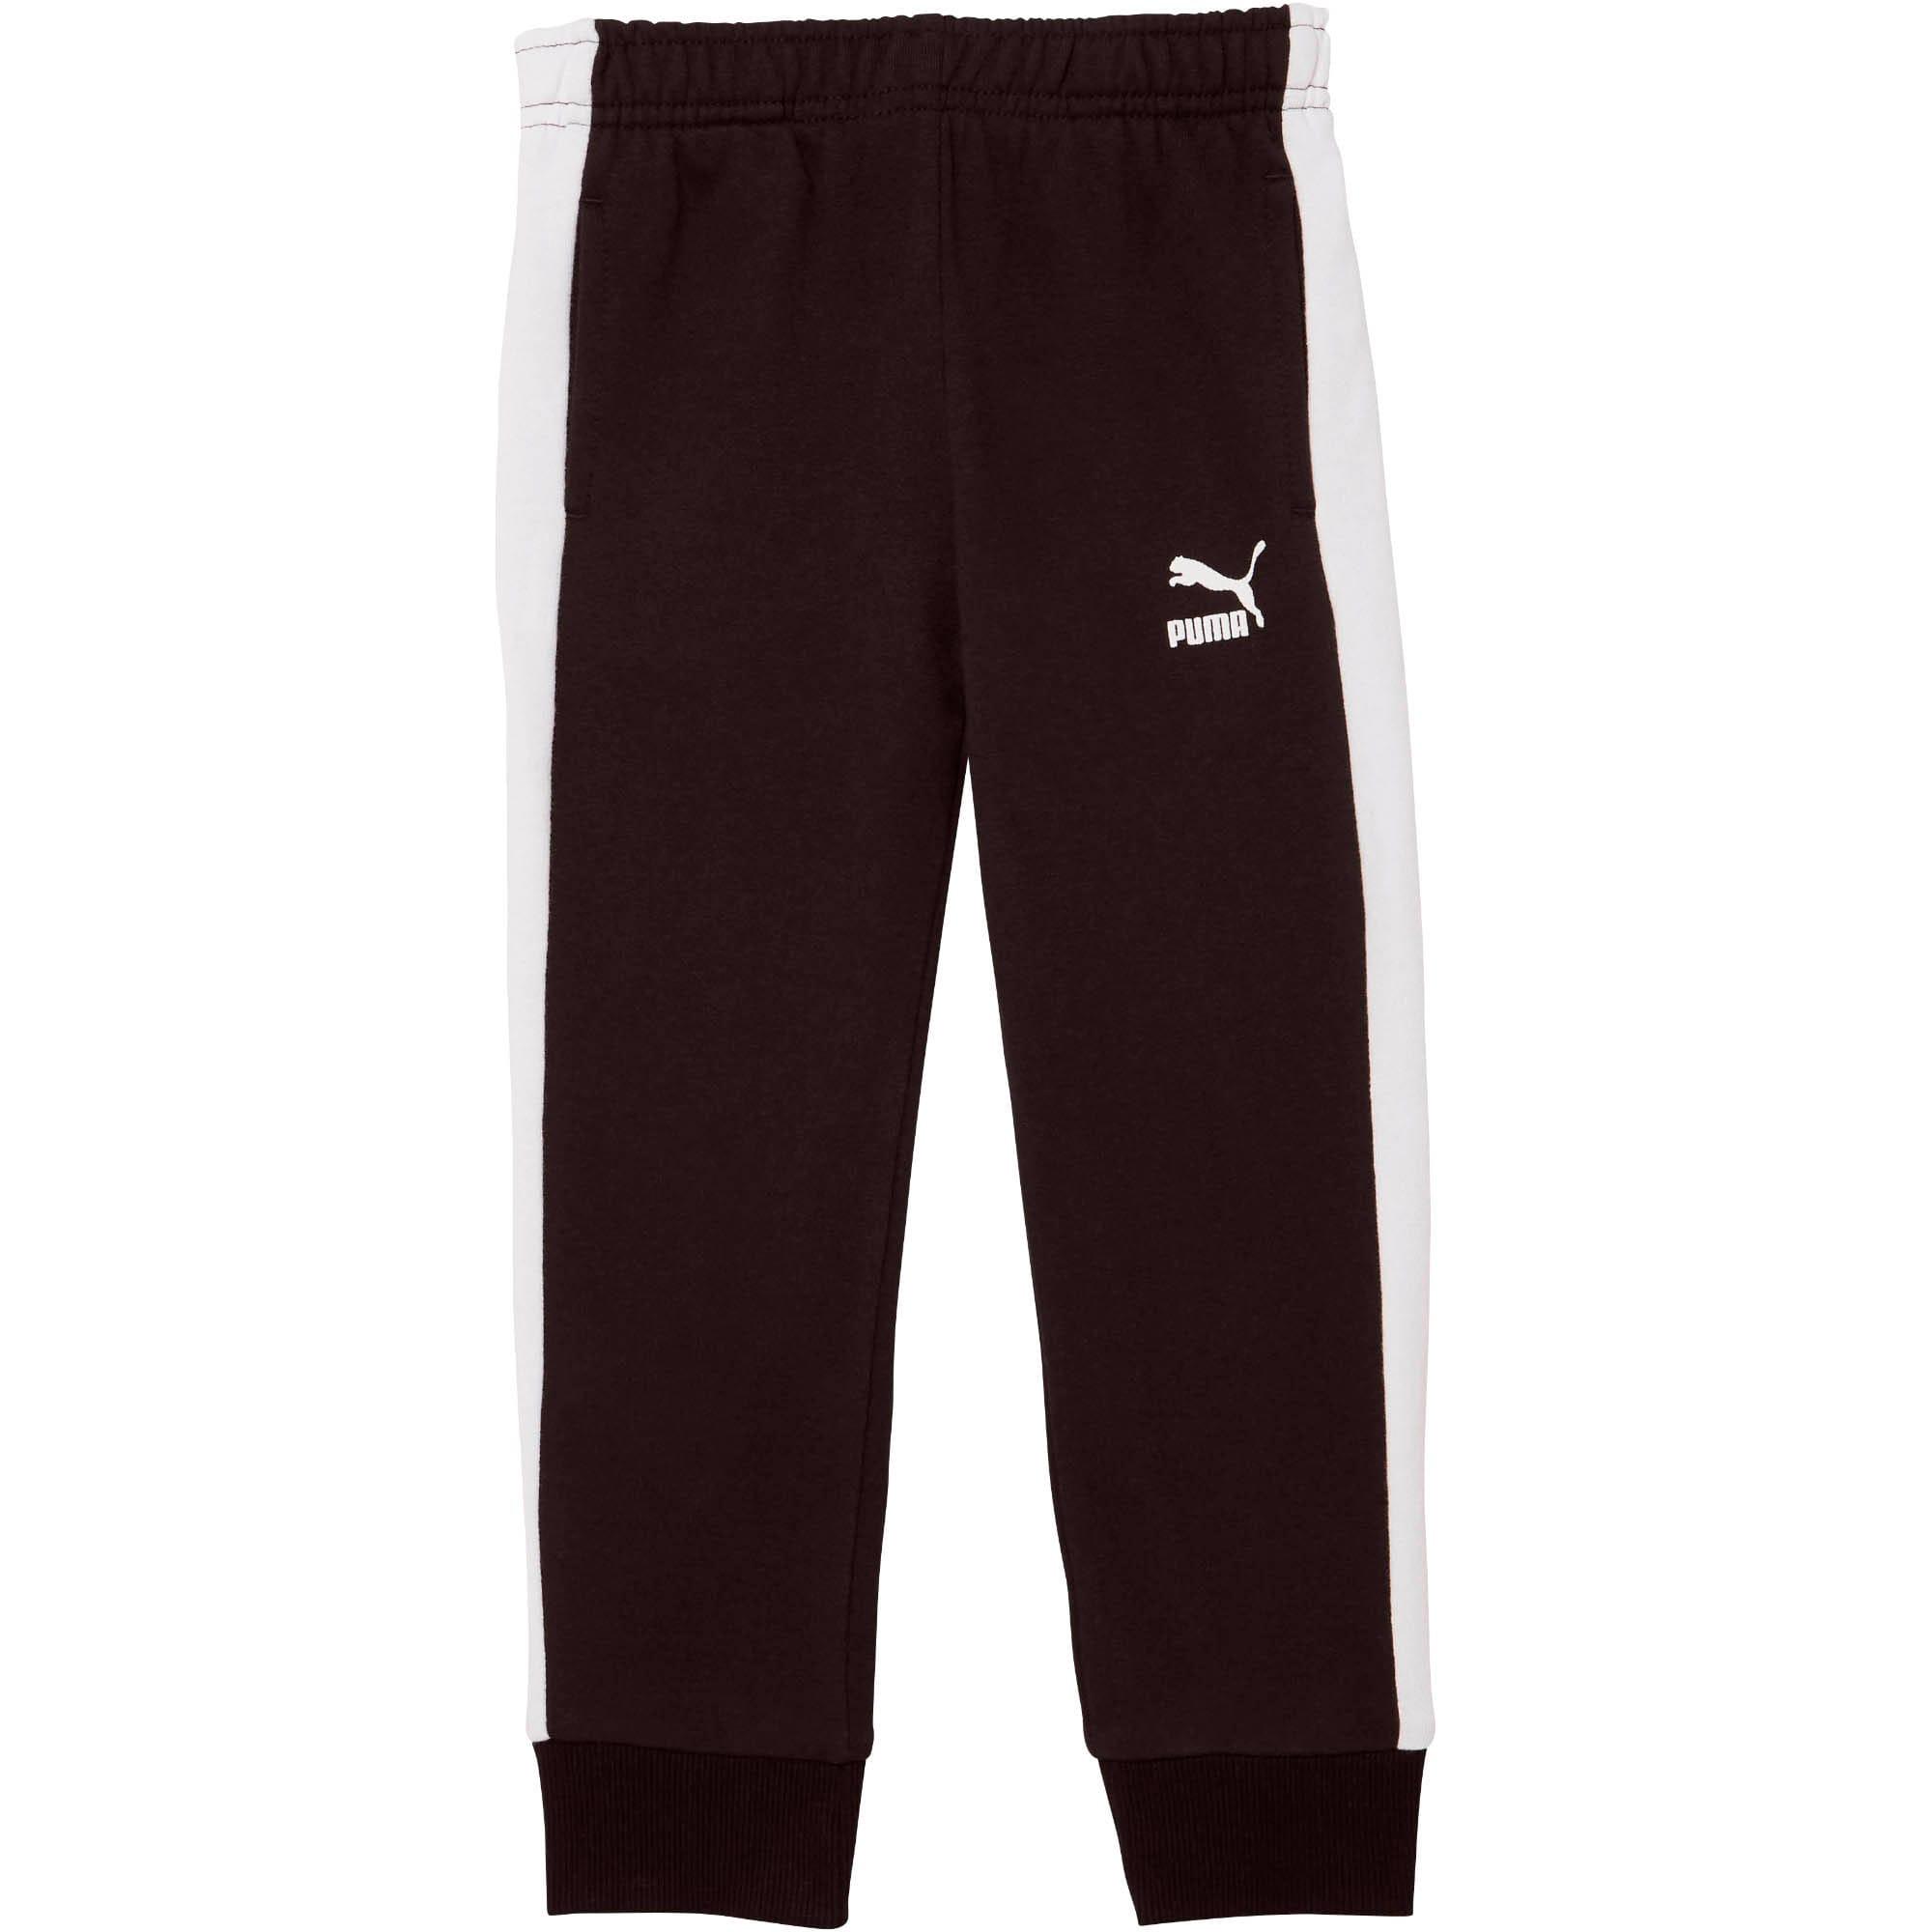 Vignette 1 de Pantalon de survêtement T7, tout-petit, PUMA BLACK/WHITE, moyen